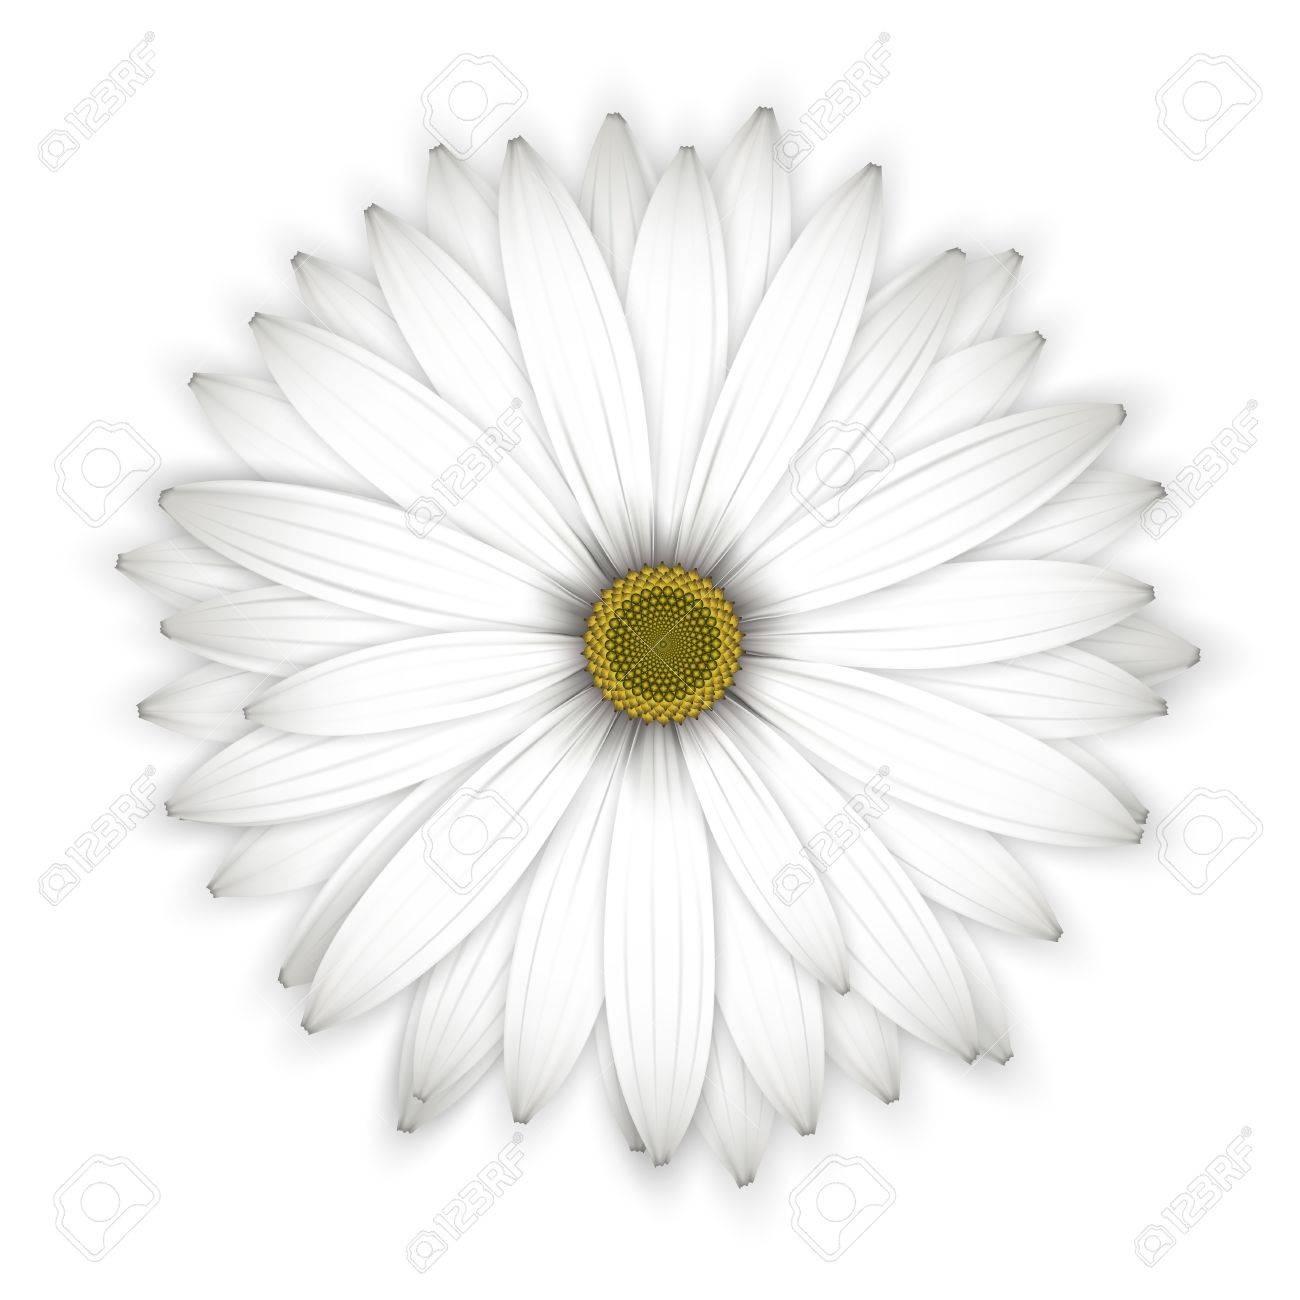 Daisy flower background. Isolated on white. Detailed illustration. Stock Vector - 21021657